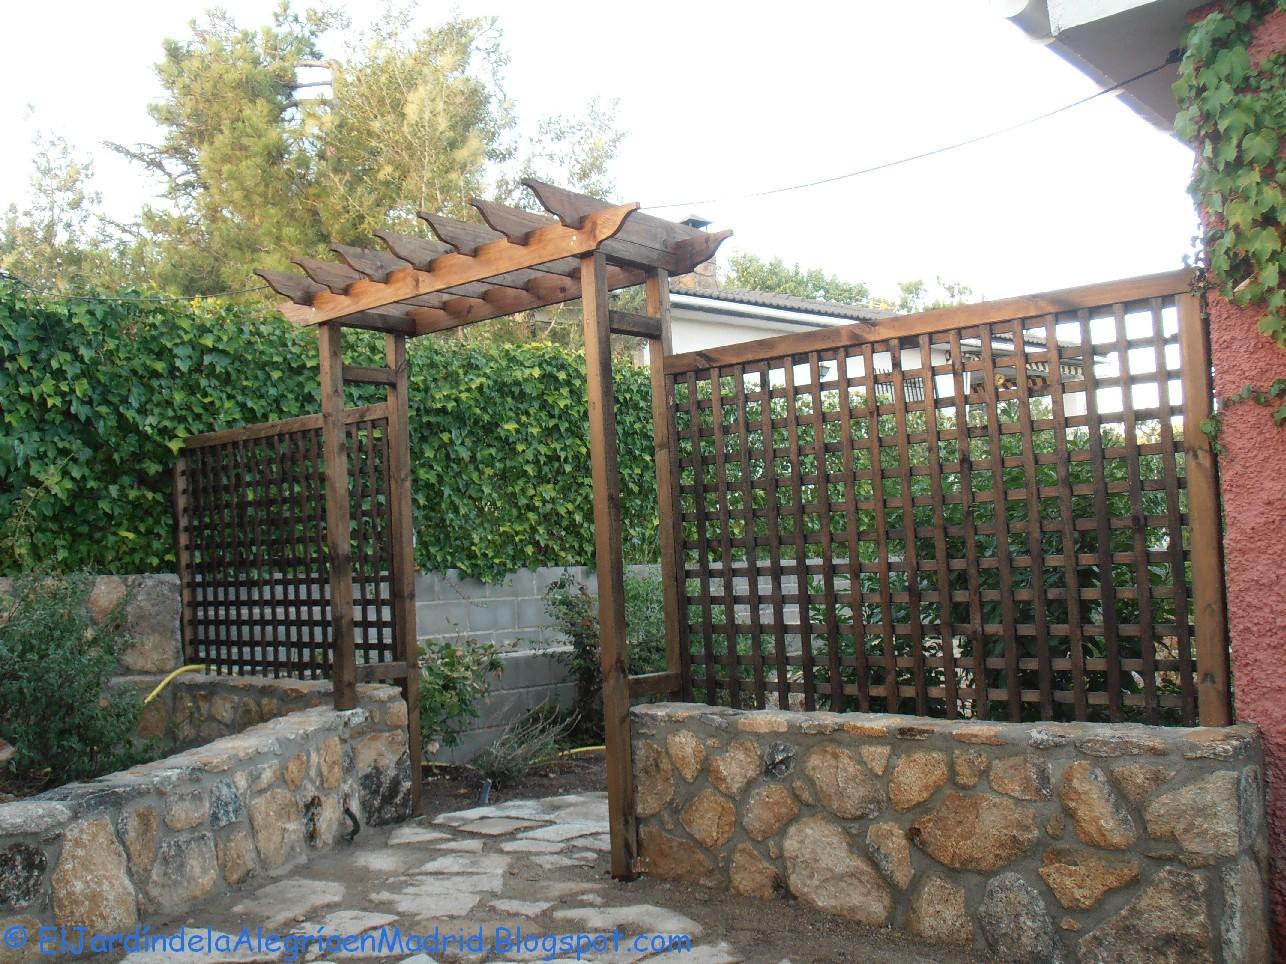 El jard n de la alegr a constru mos un arco de madera - Puerta de madera para jardin ...